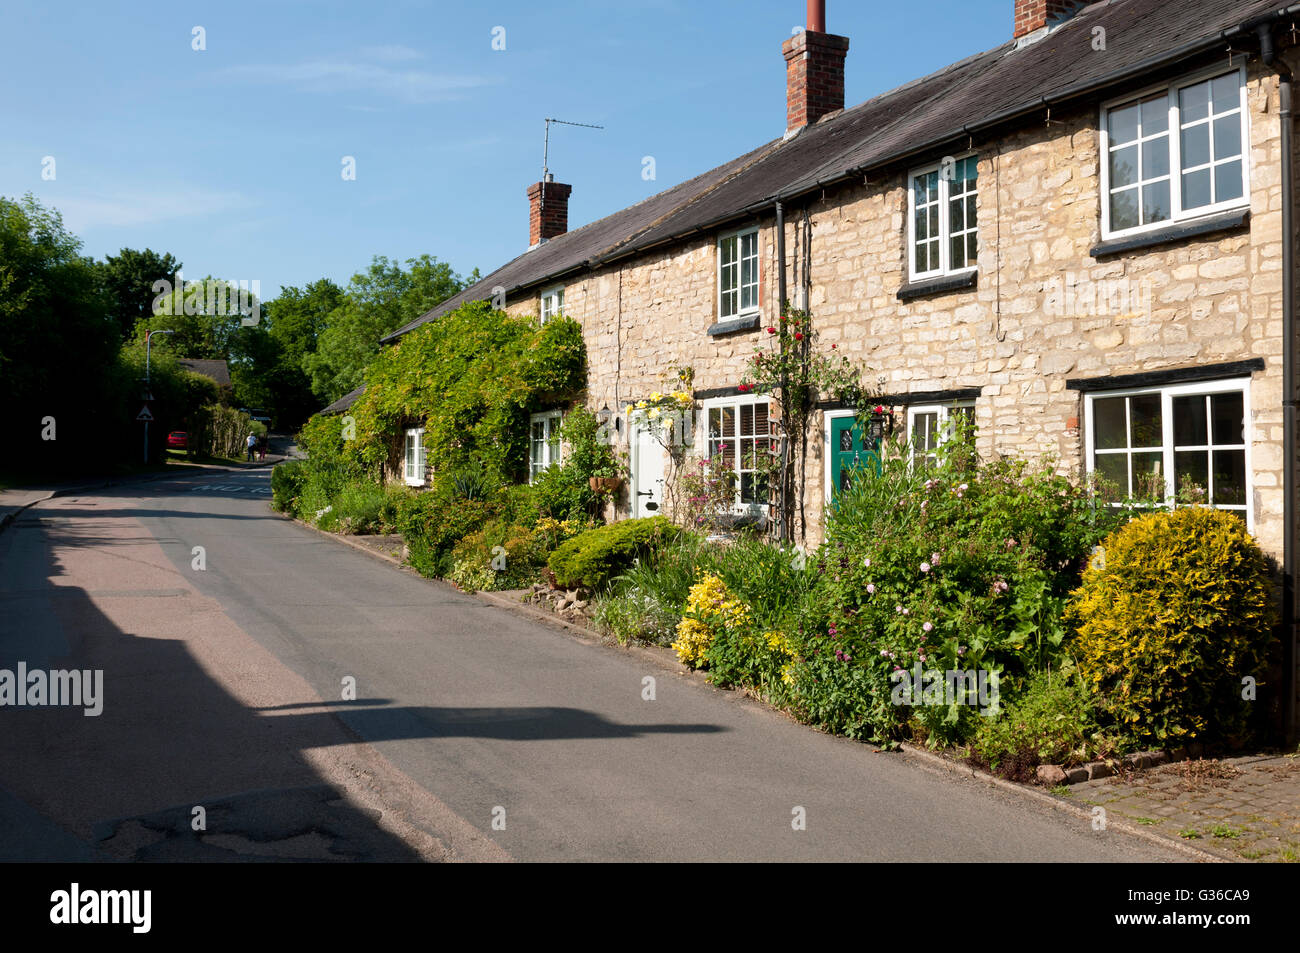 Cosgrove village, Northamptonshire, England, UK - Stock Image